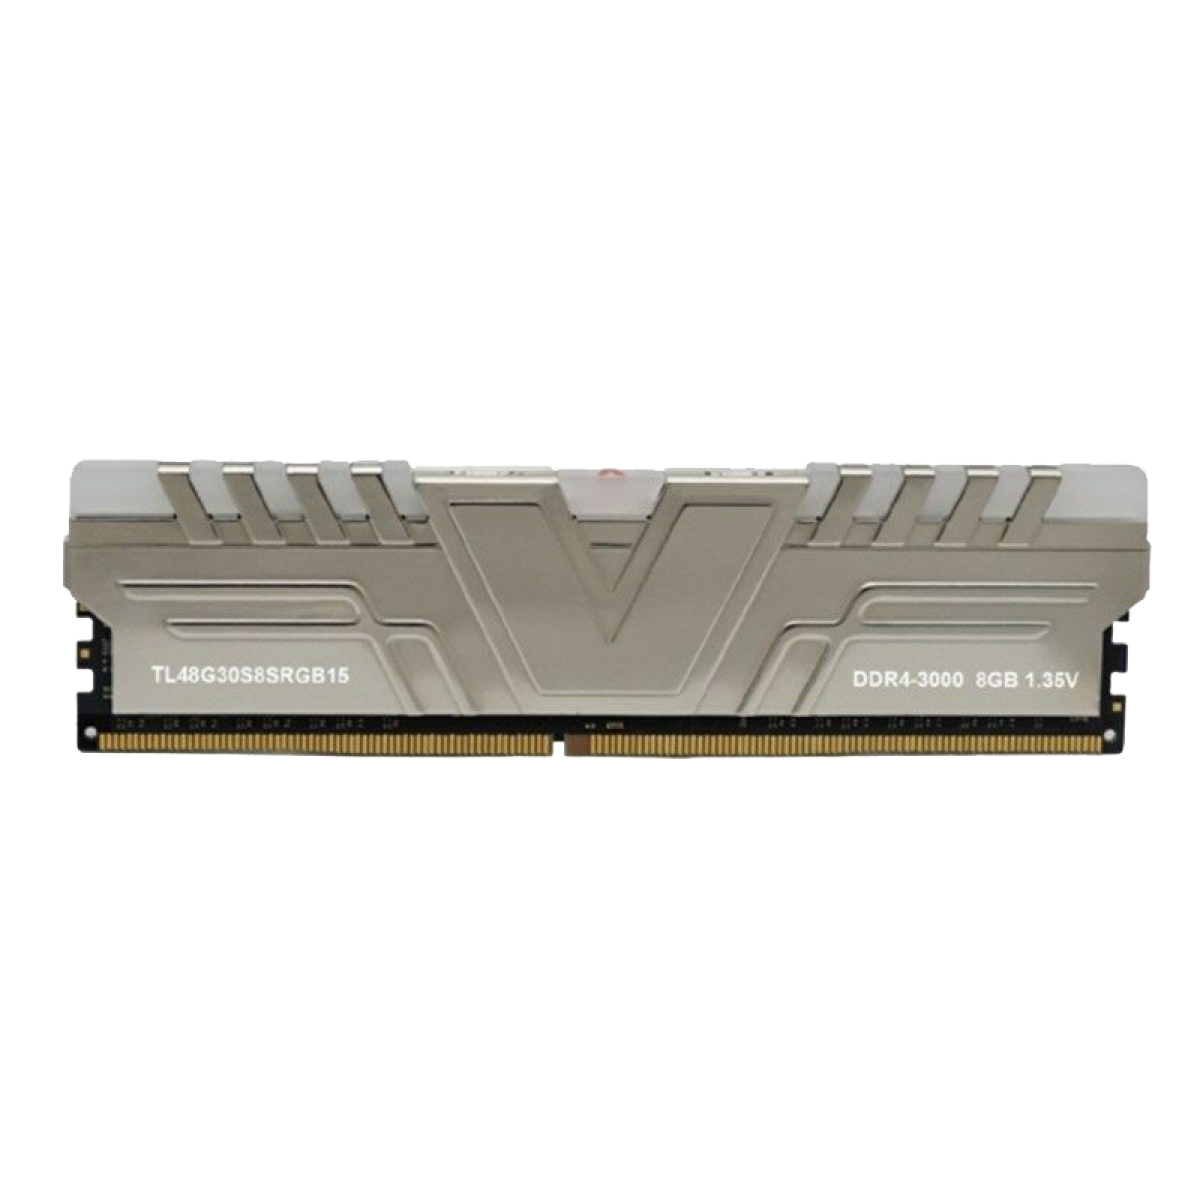 Memória V-color DDR4 SKYWALKER PRISM RGB 3000 U-dimm, 8GB, 3000MHZ, GRAY, TL48G30S8SRGB15